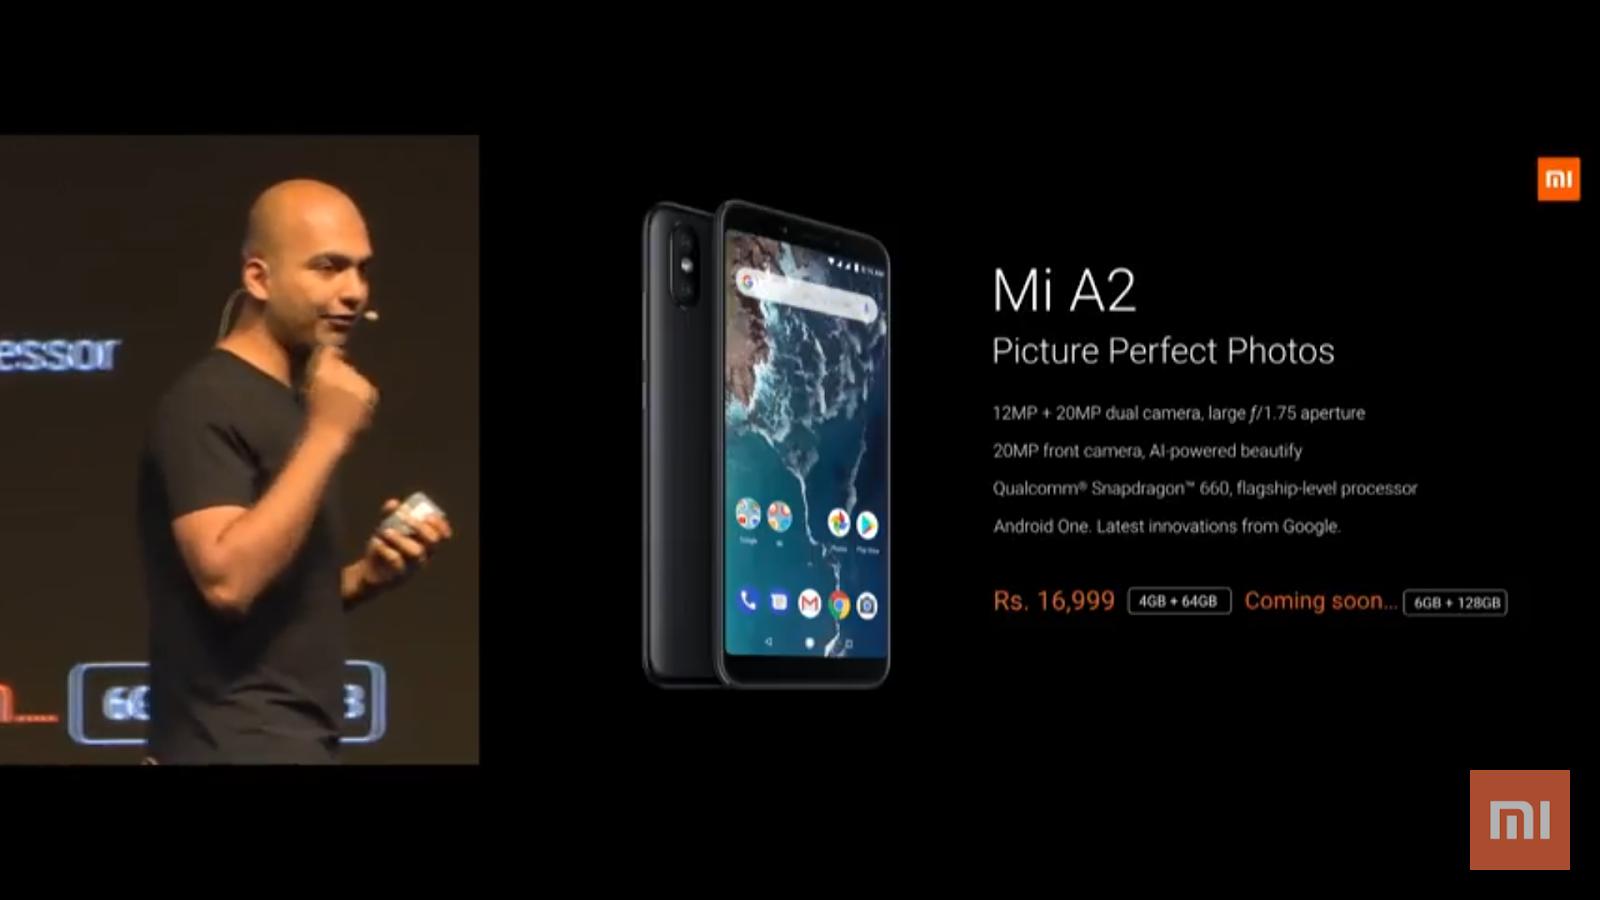 Xiaomi Mi A2 (Review) - New Viral Post